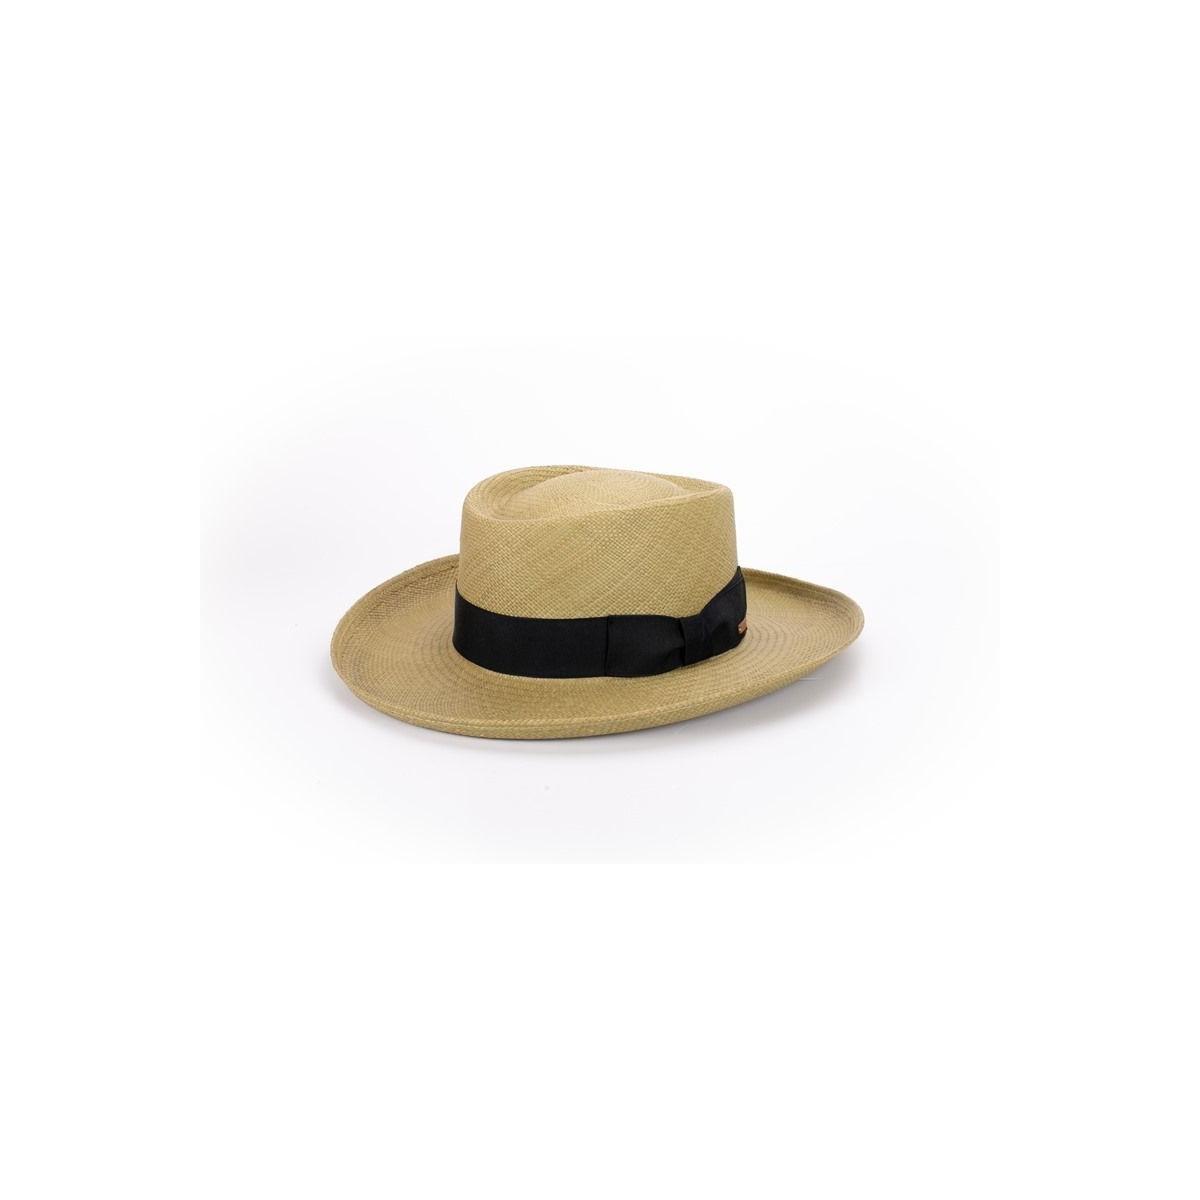 sombrero-hombre-panama-jambi-paja-toquillera-kaki-Fernandez-y-Roche-1